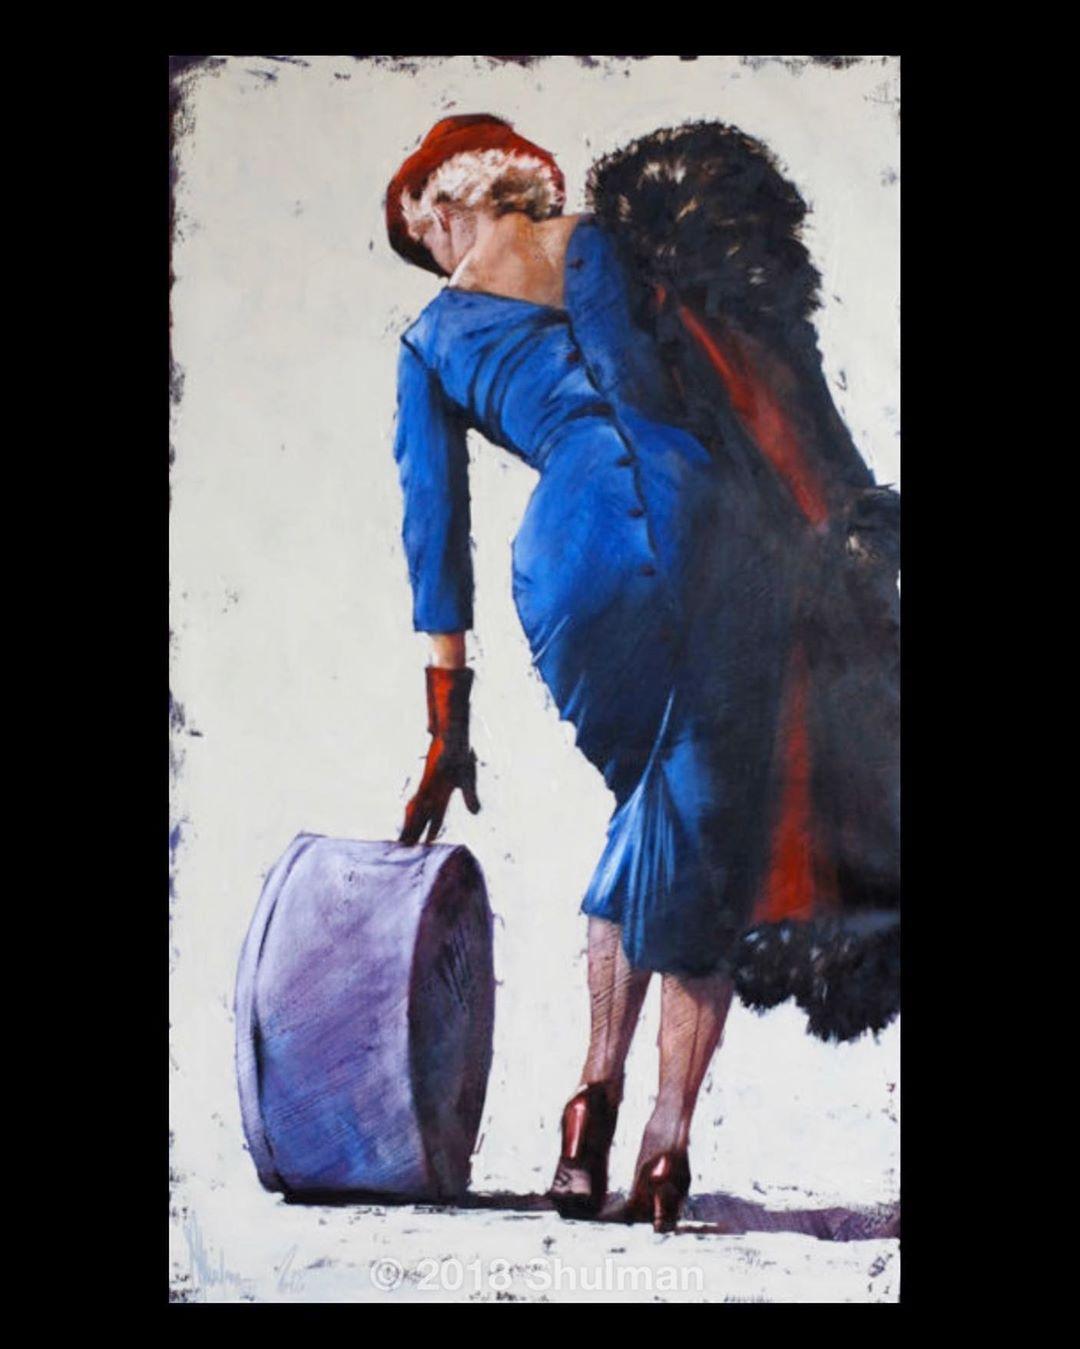 Moving art work in social